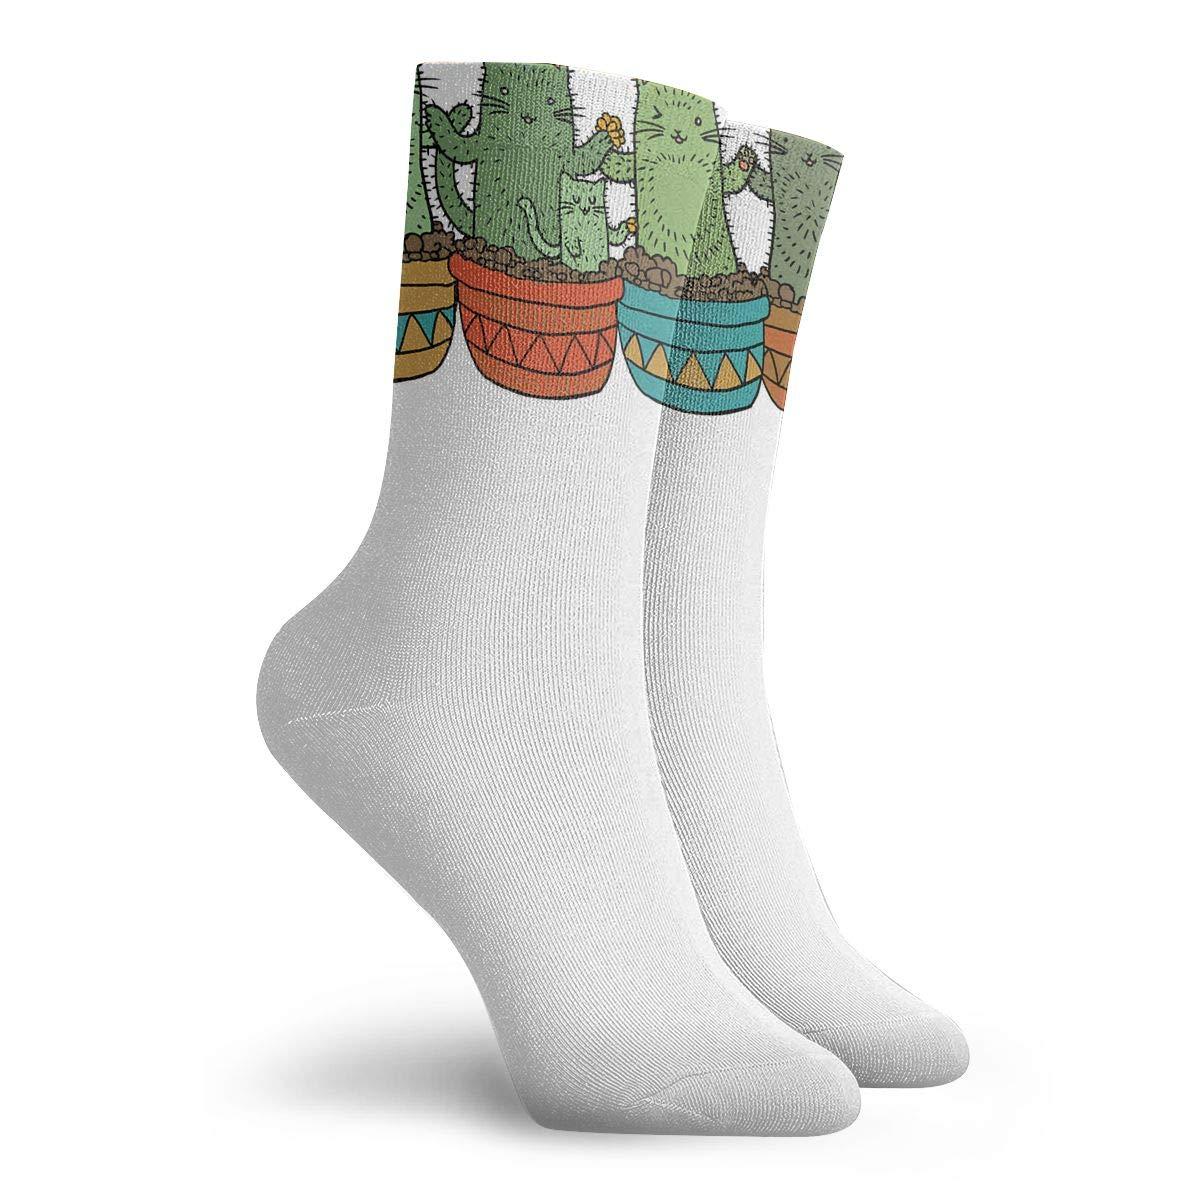 YIEOFH Annual Painting Animal Novelty Boys Girls Fashion Cute Funny Casual Art Crew Socks